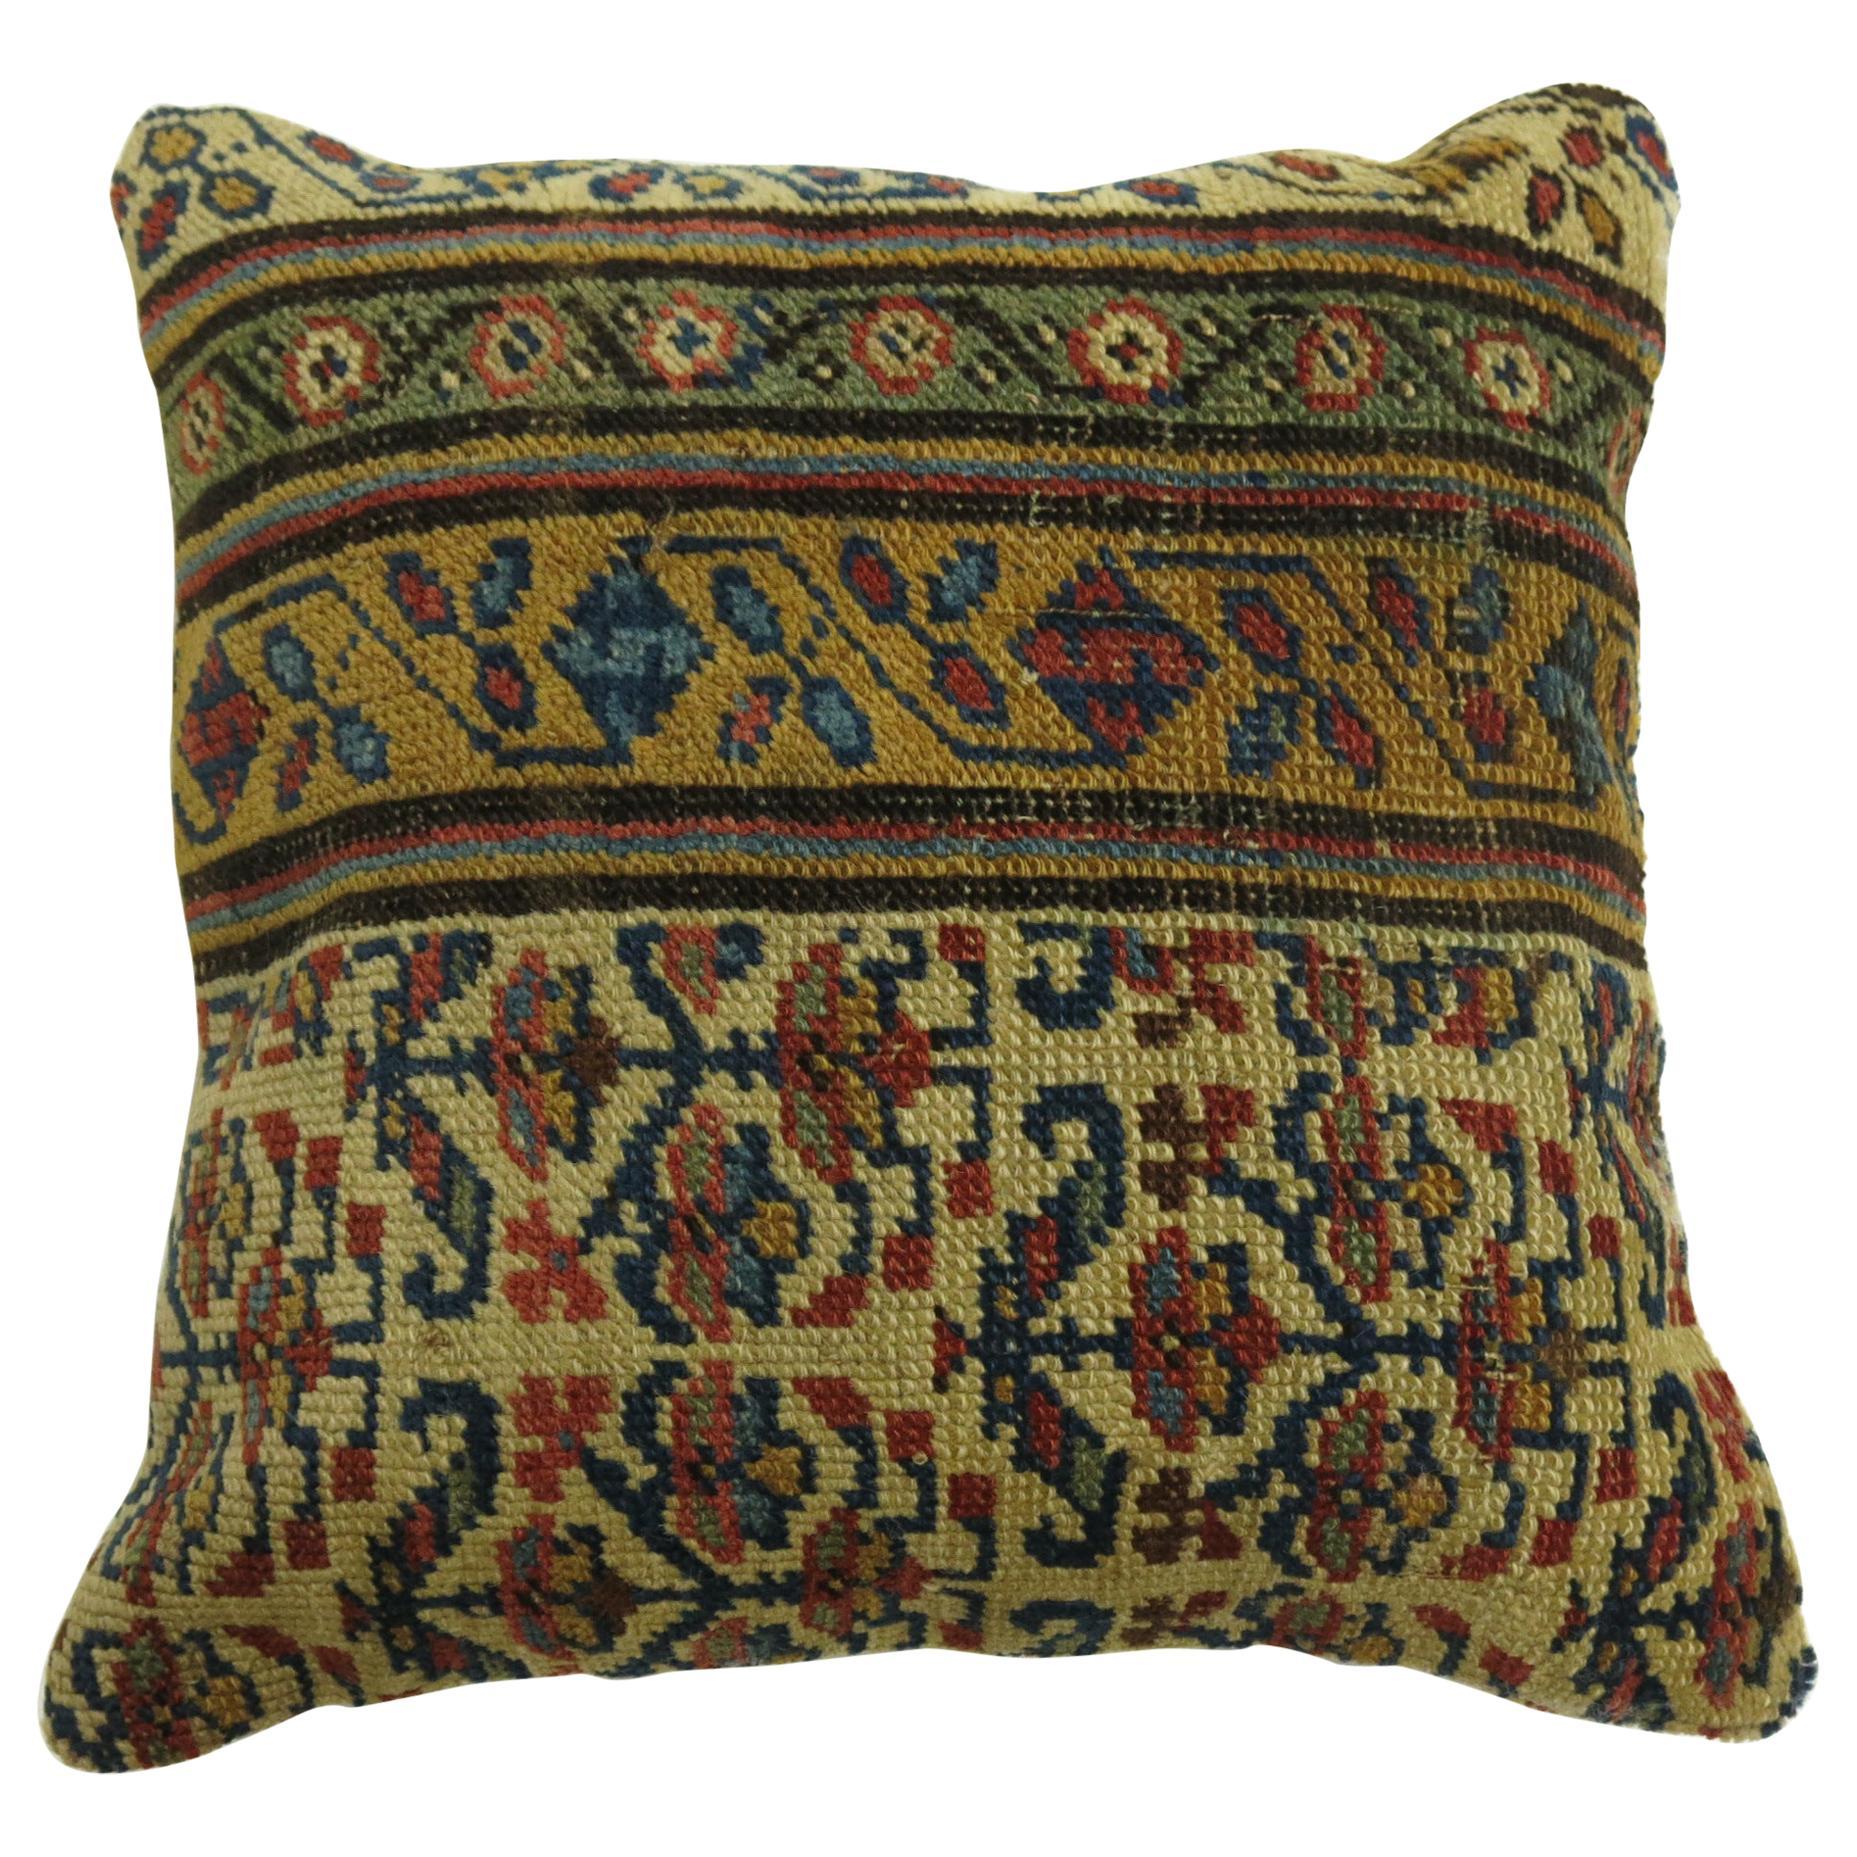 Tribal Kurdish Rug Pillow